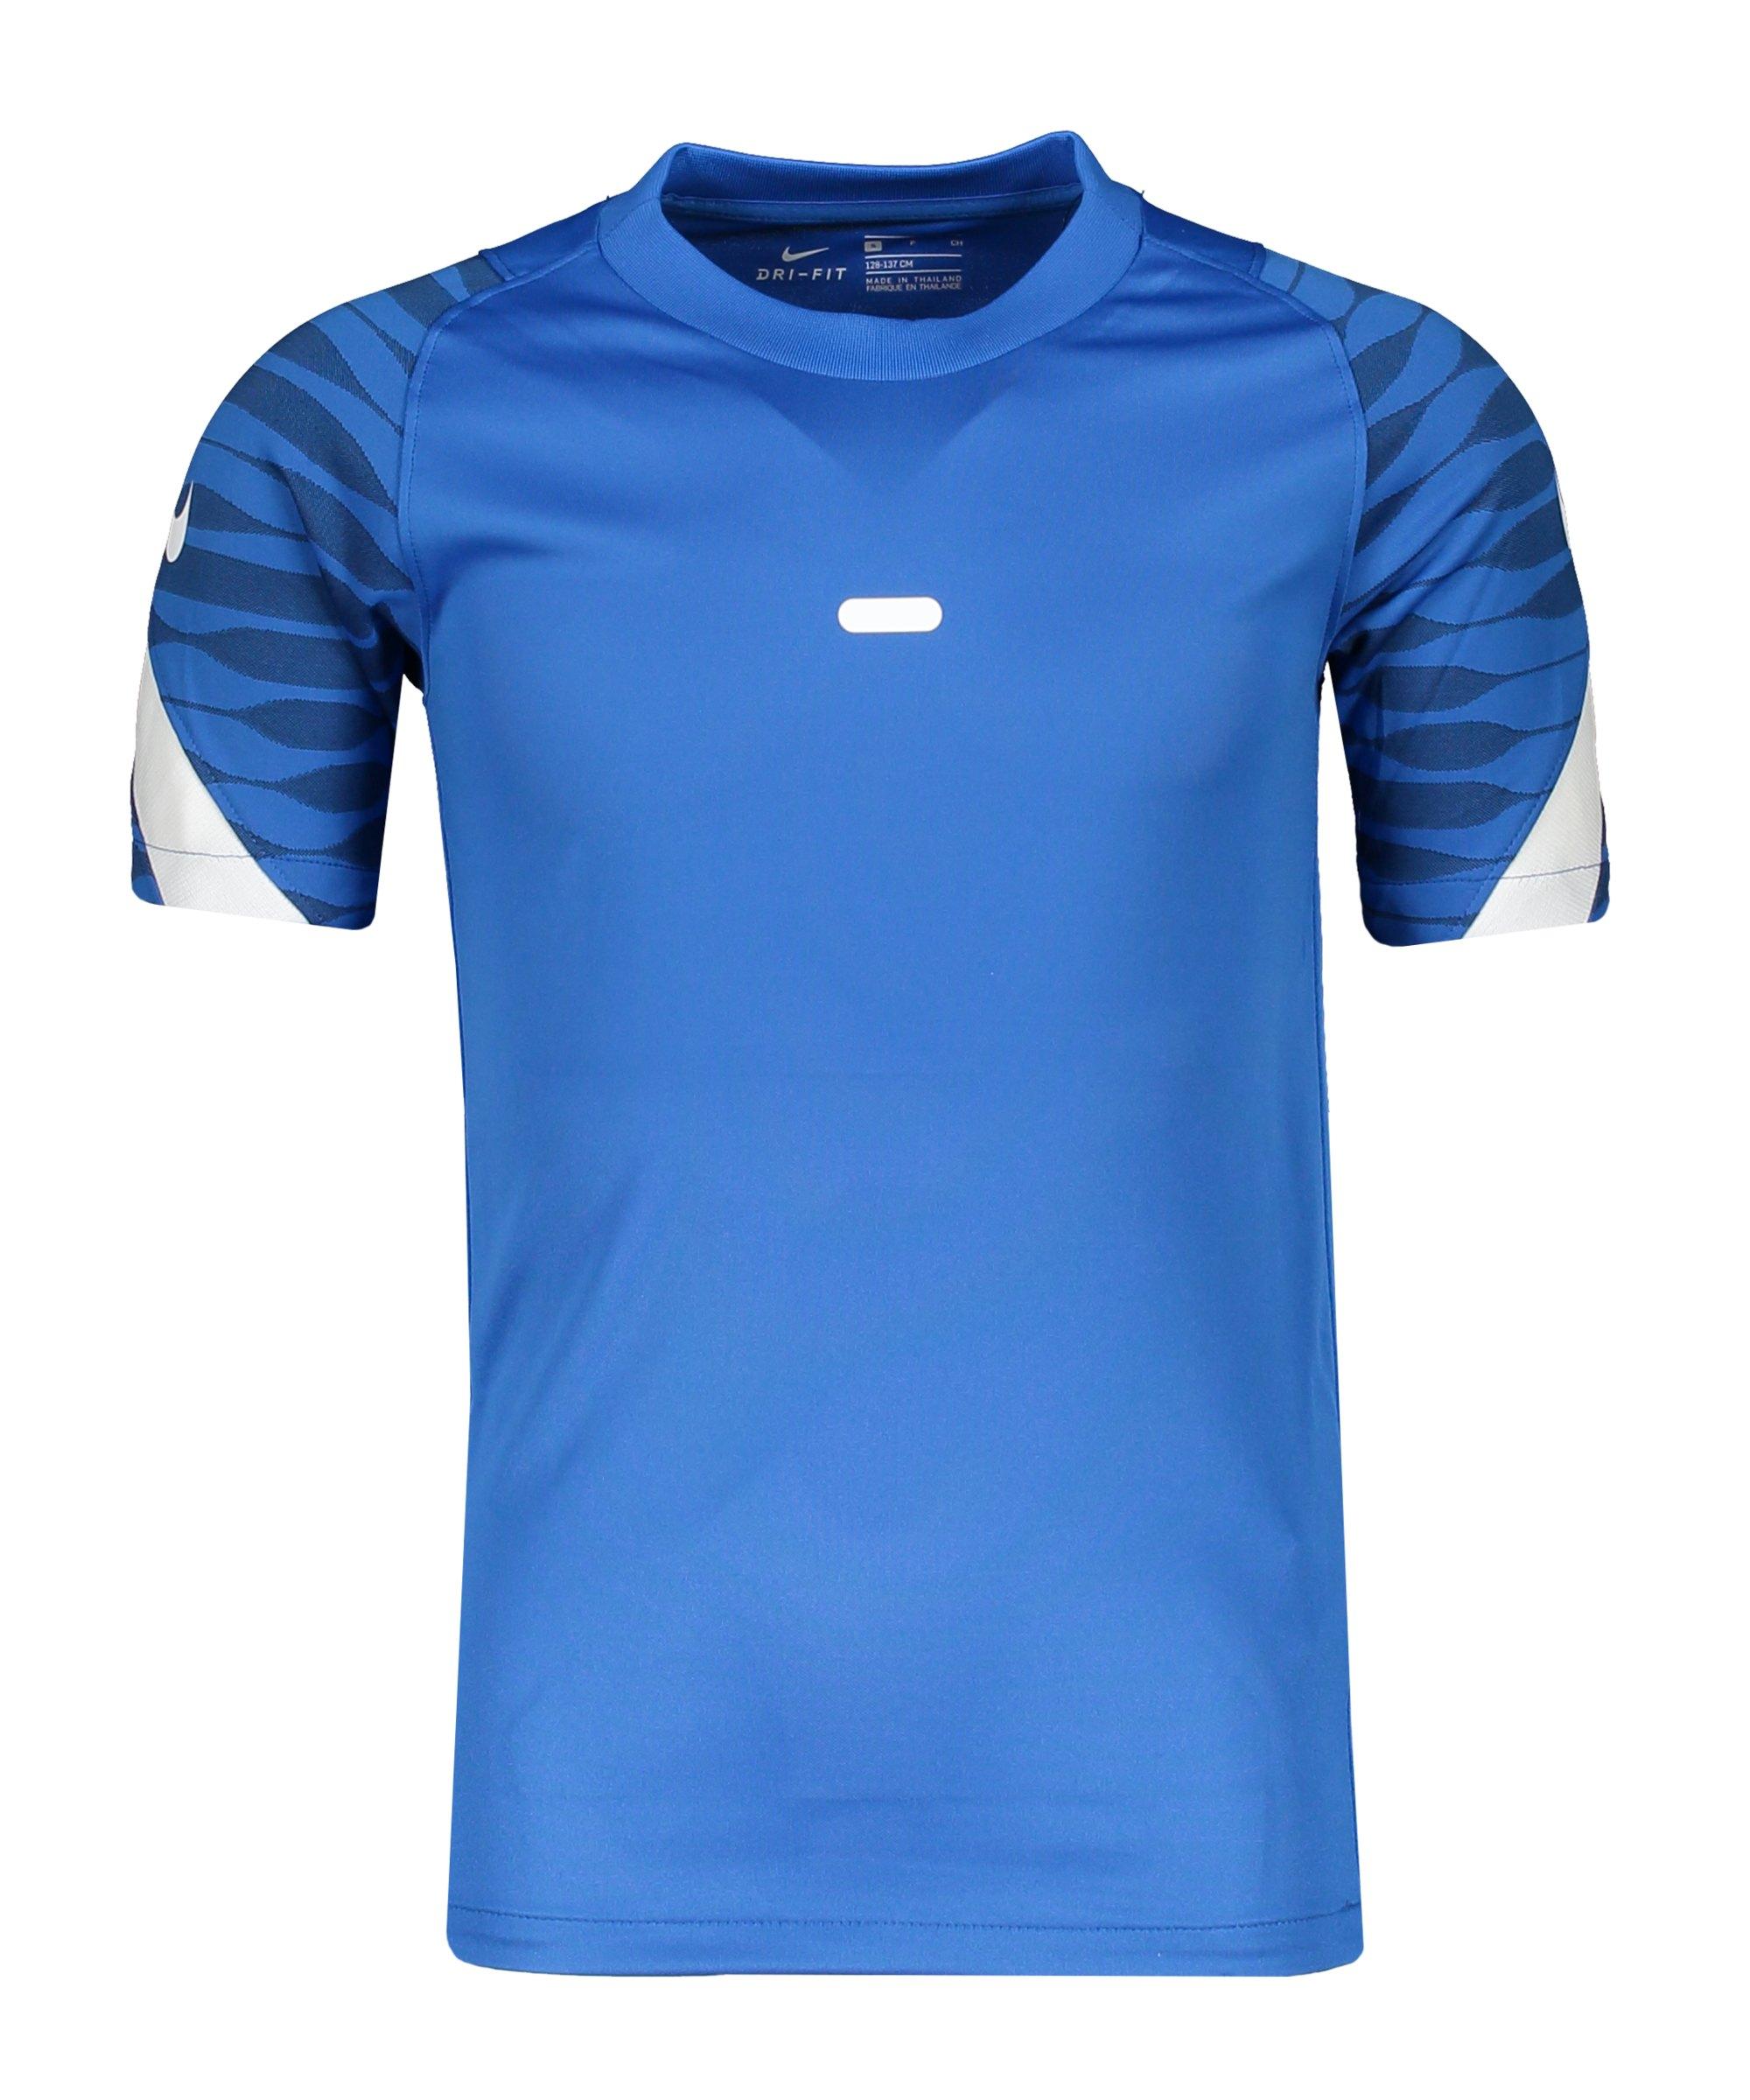 Nike Strike 21 T-Shirt Blau Weiss F463 - blau